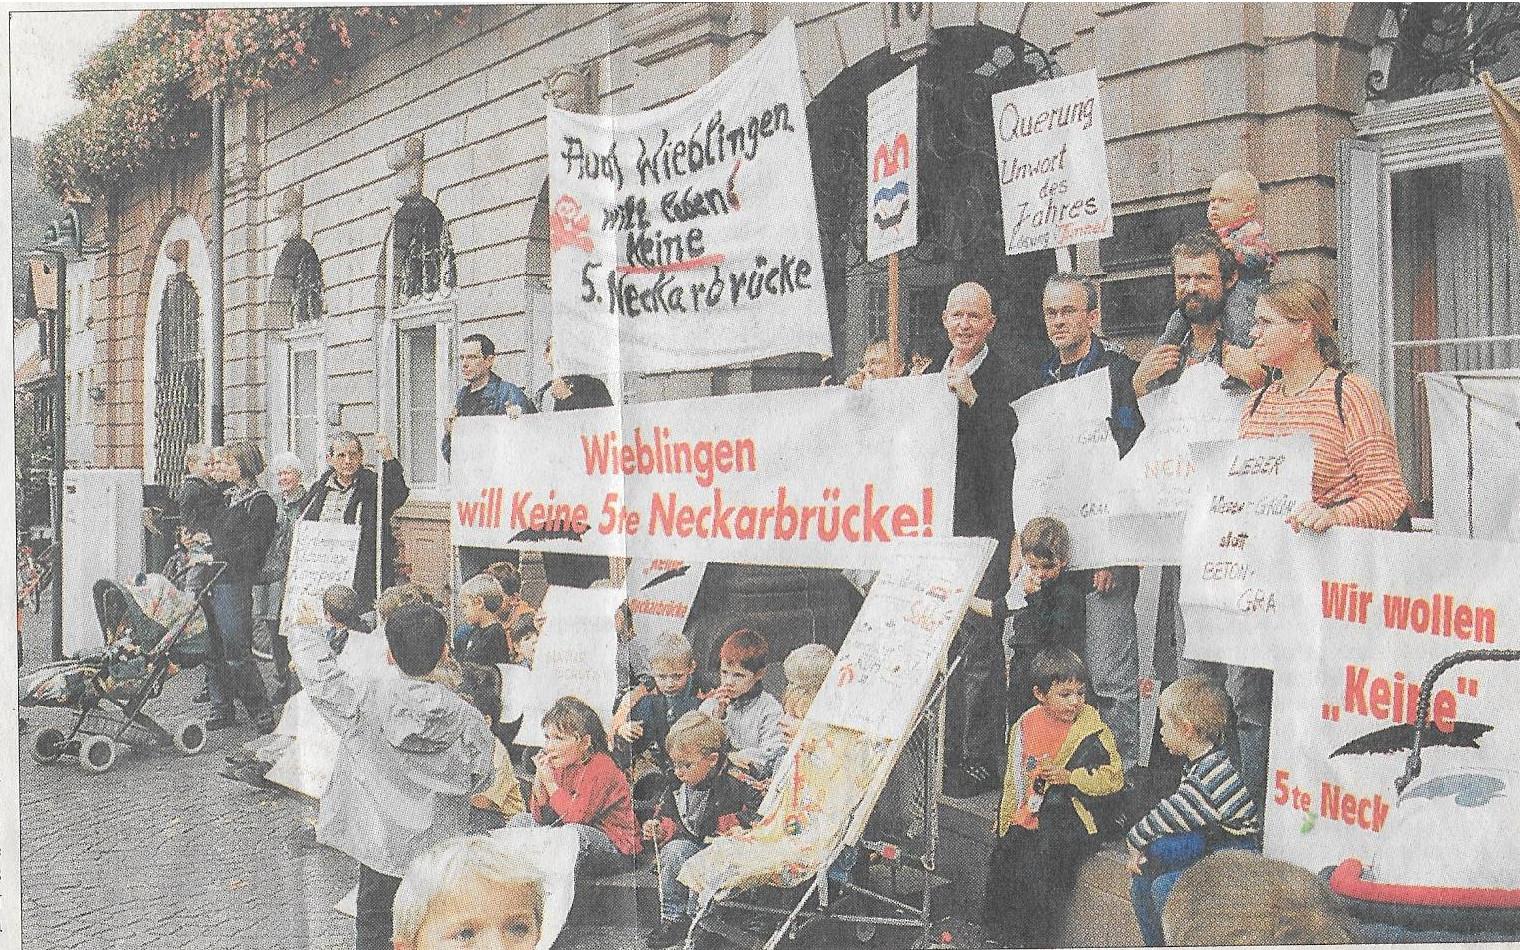 Demo vor dem Rathaus 2001